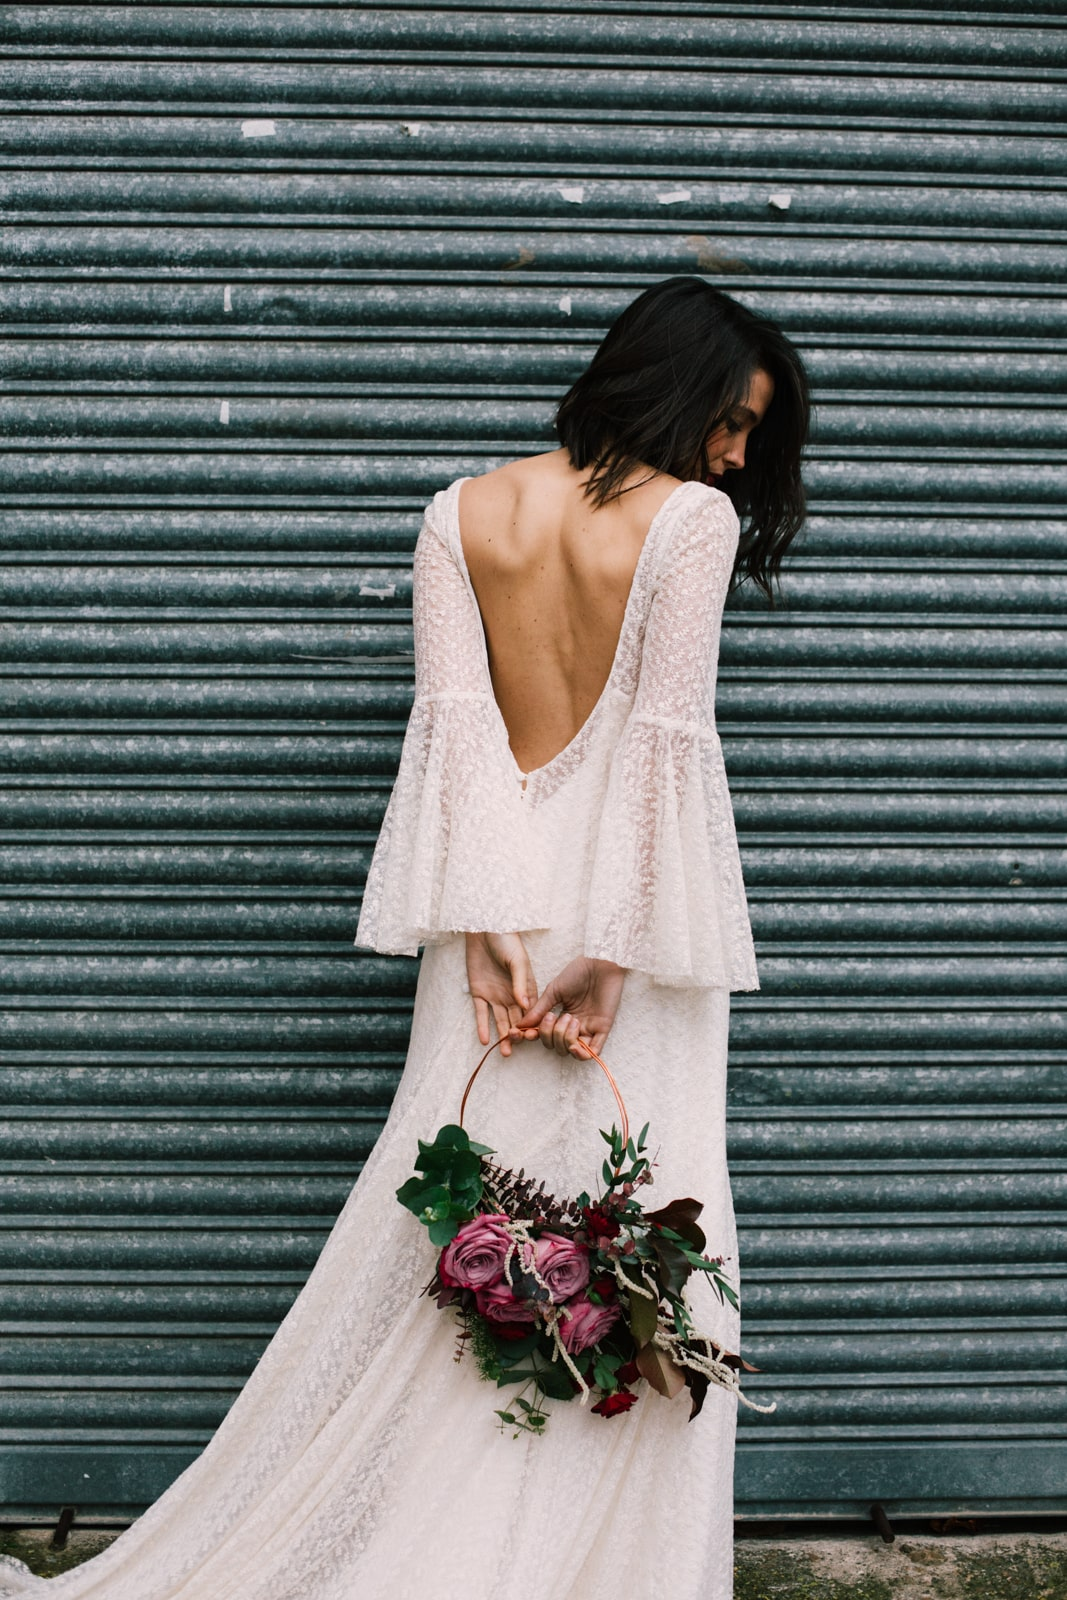 Wedding_planner_bilbao_alegria_macarena7.jpg